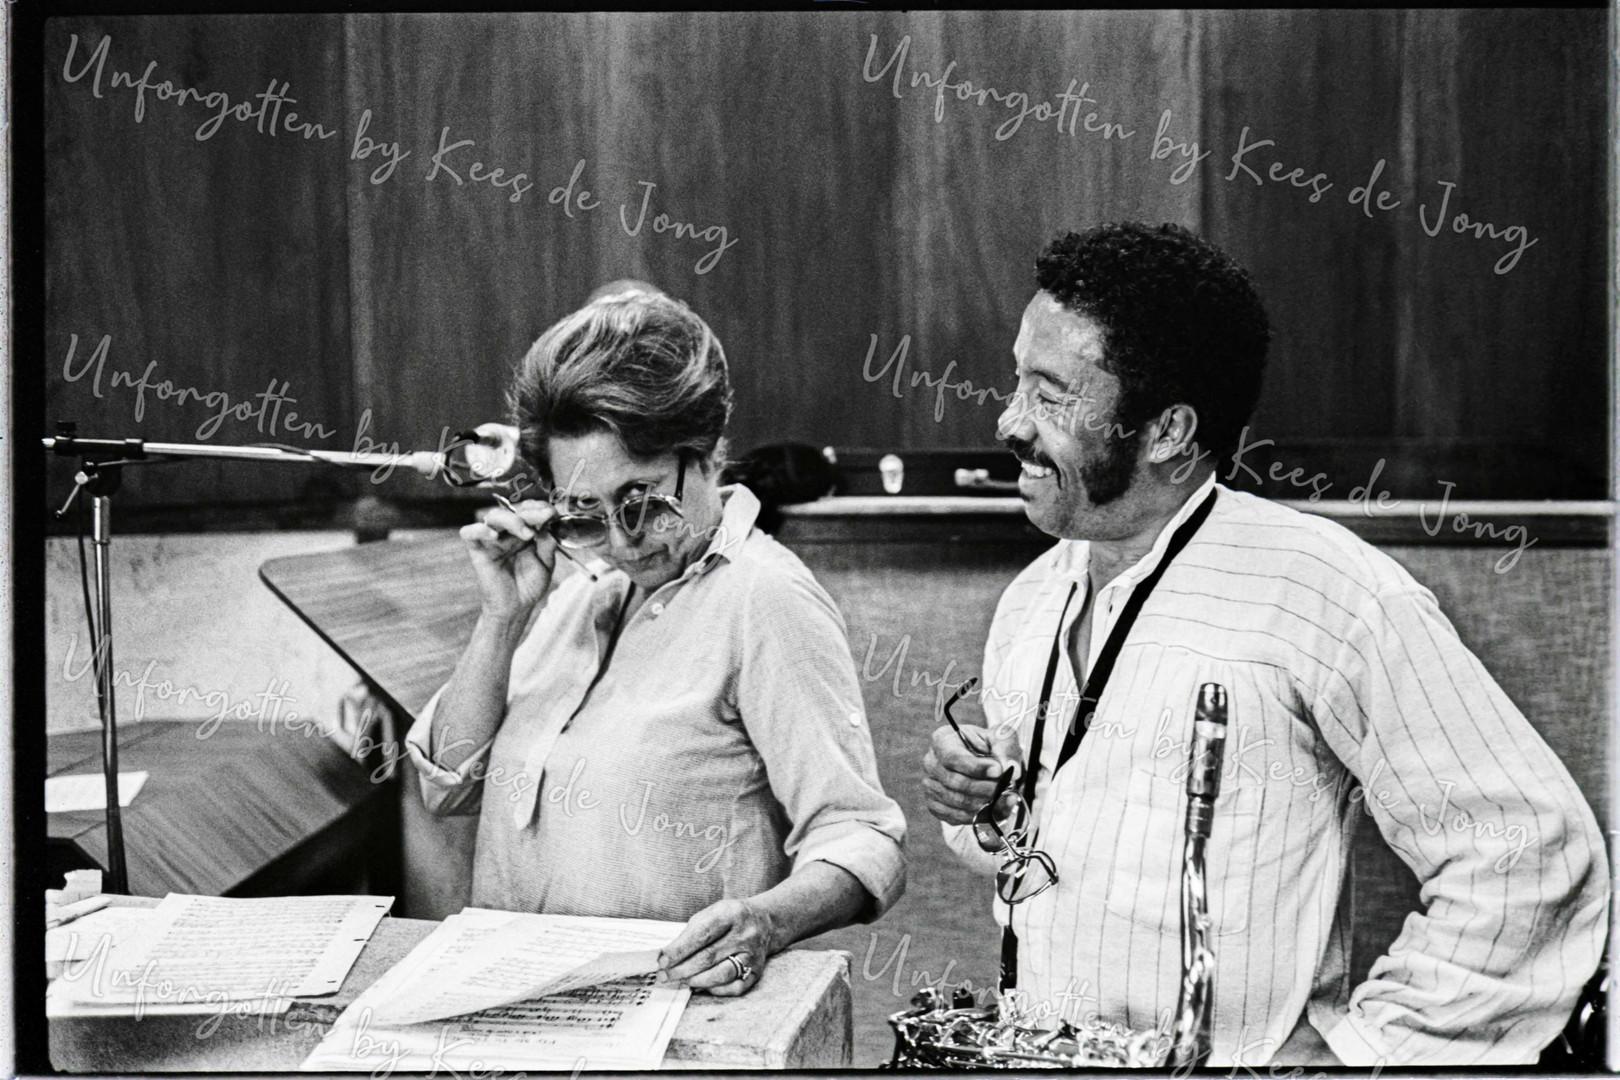 Rita Reys & Johnny Griffith